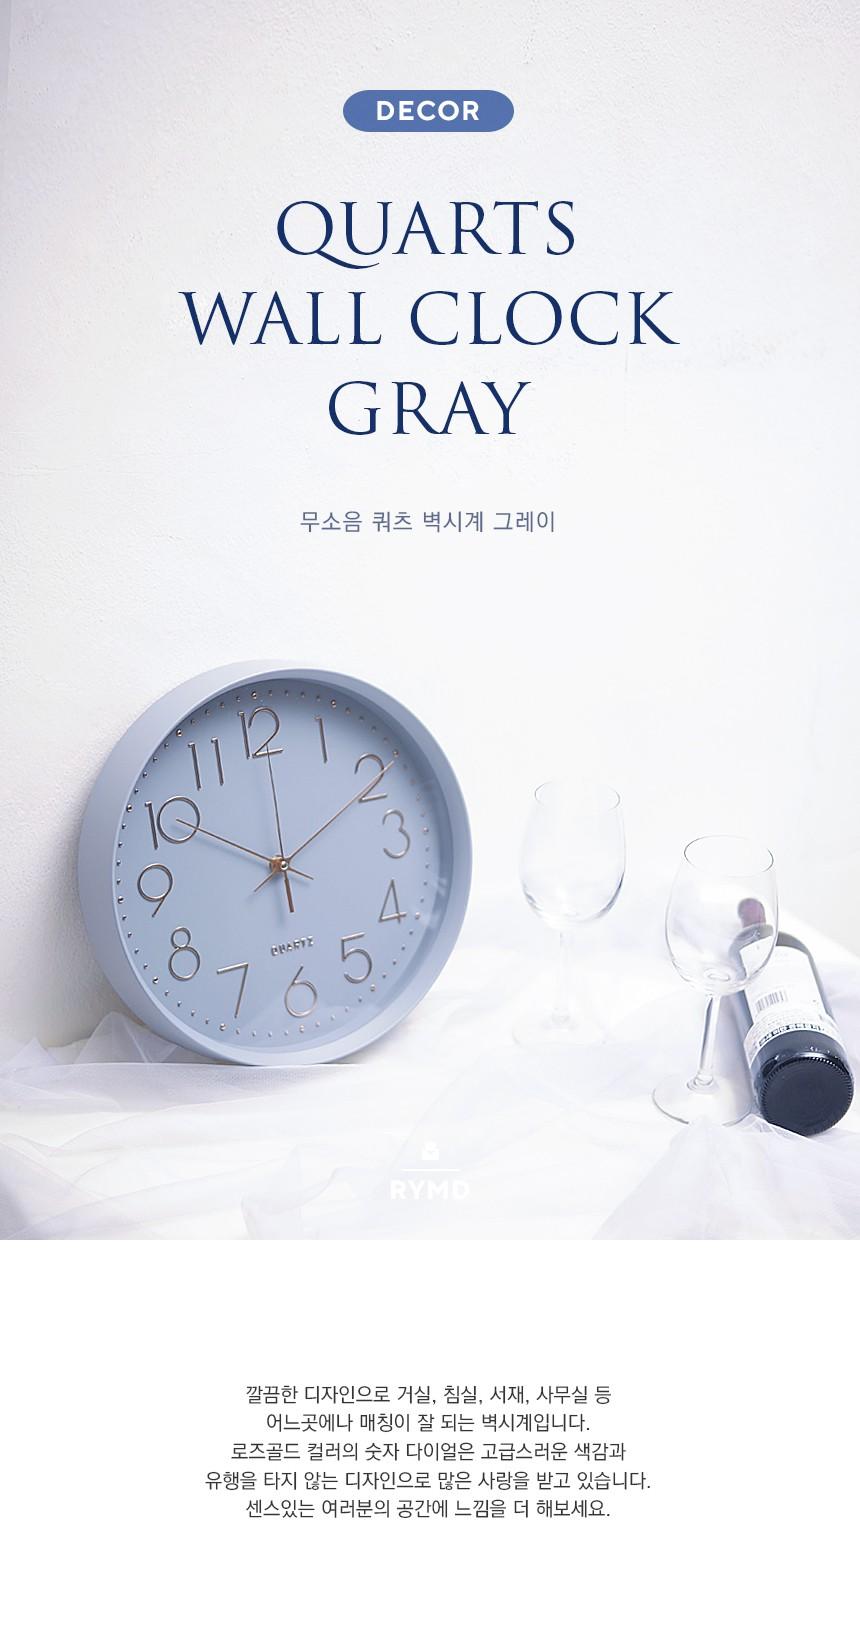 QUARTS_WALL_CLOCK_GRAY_01.jpg